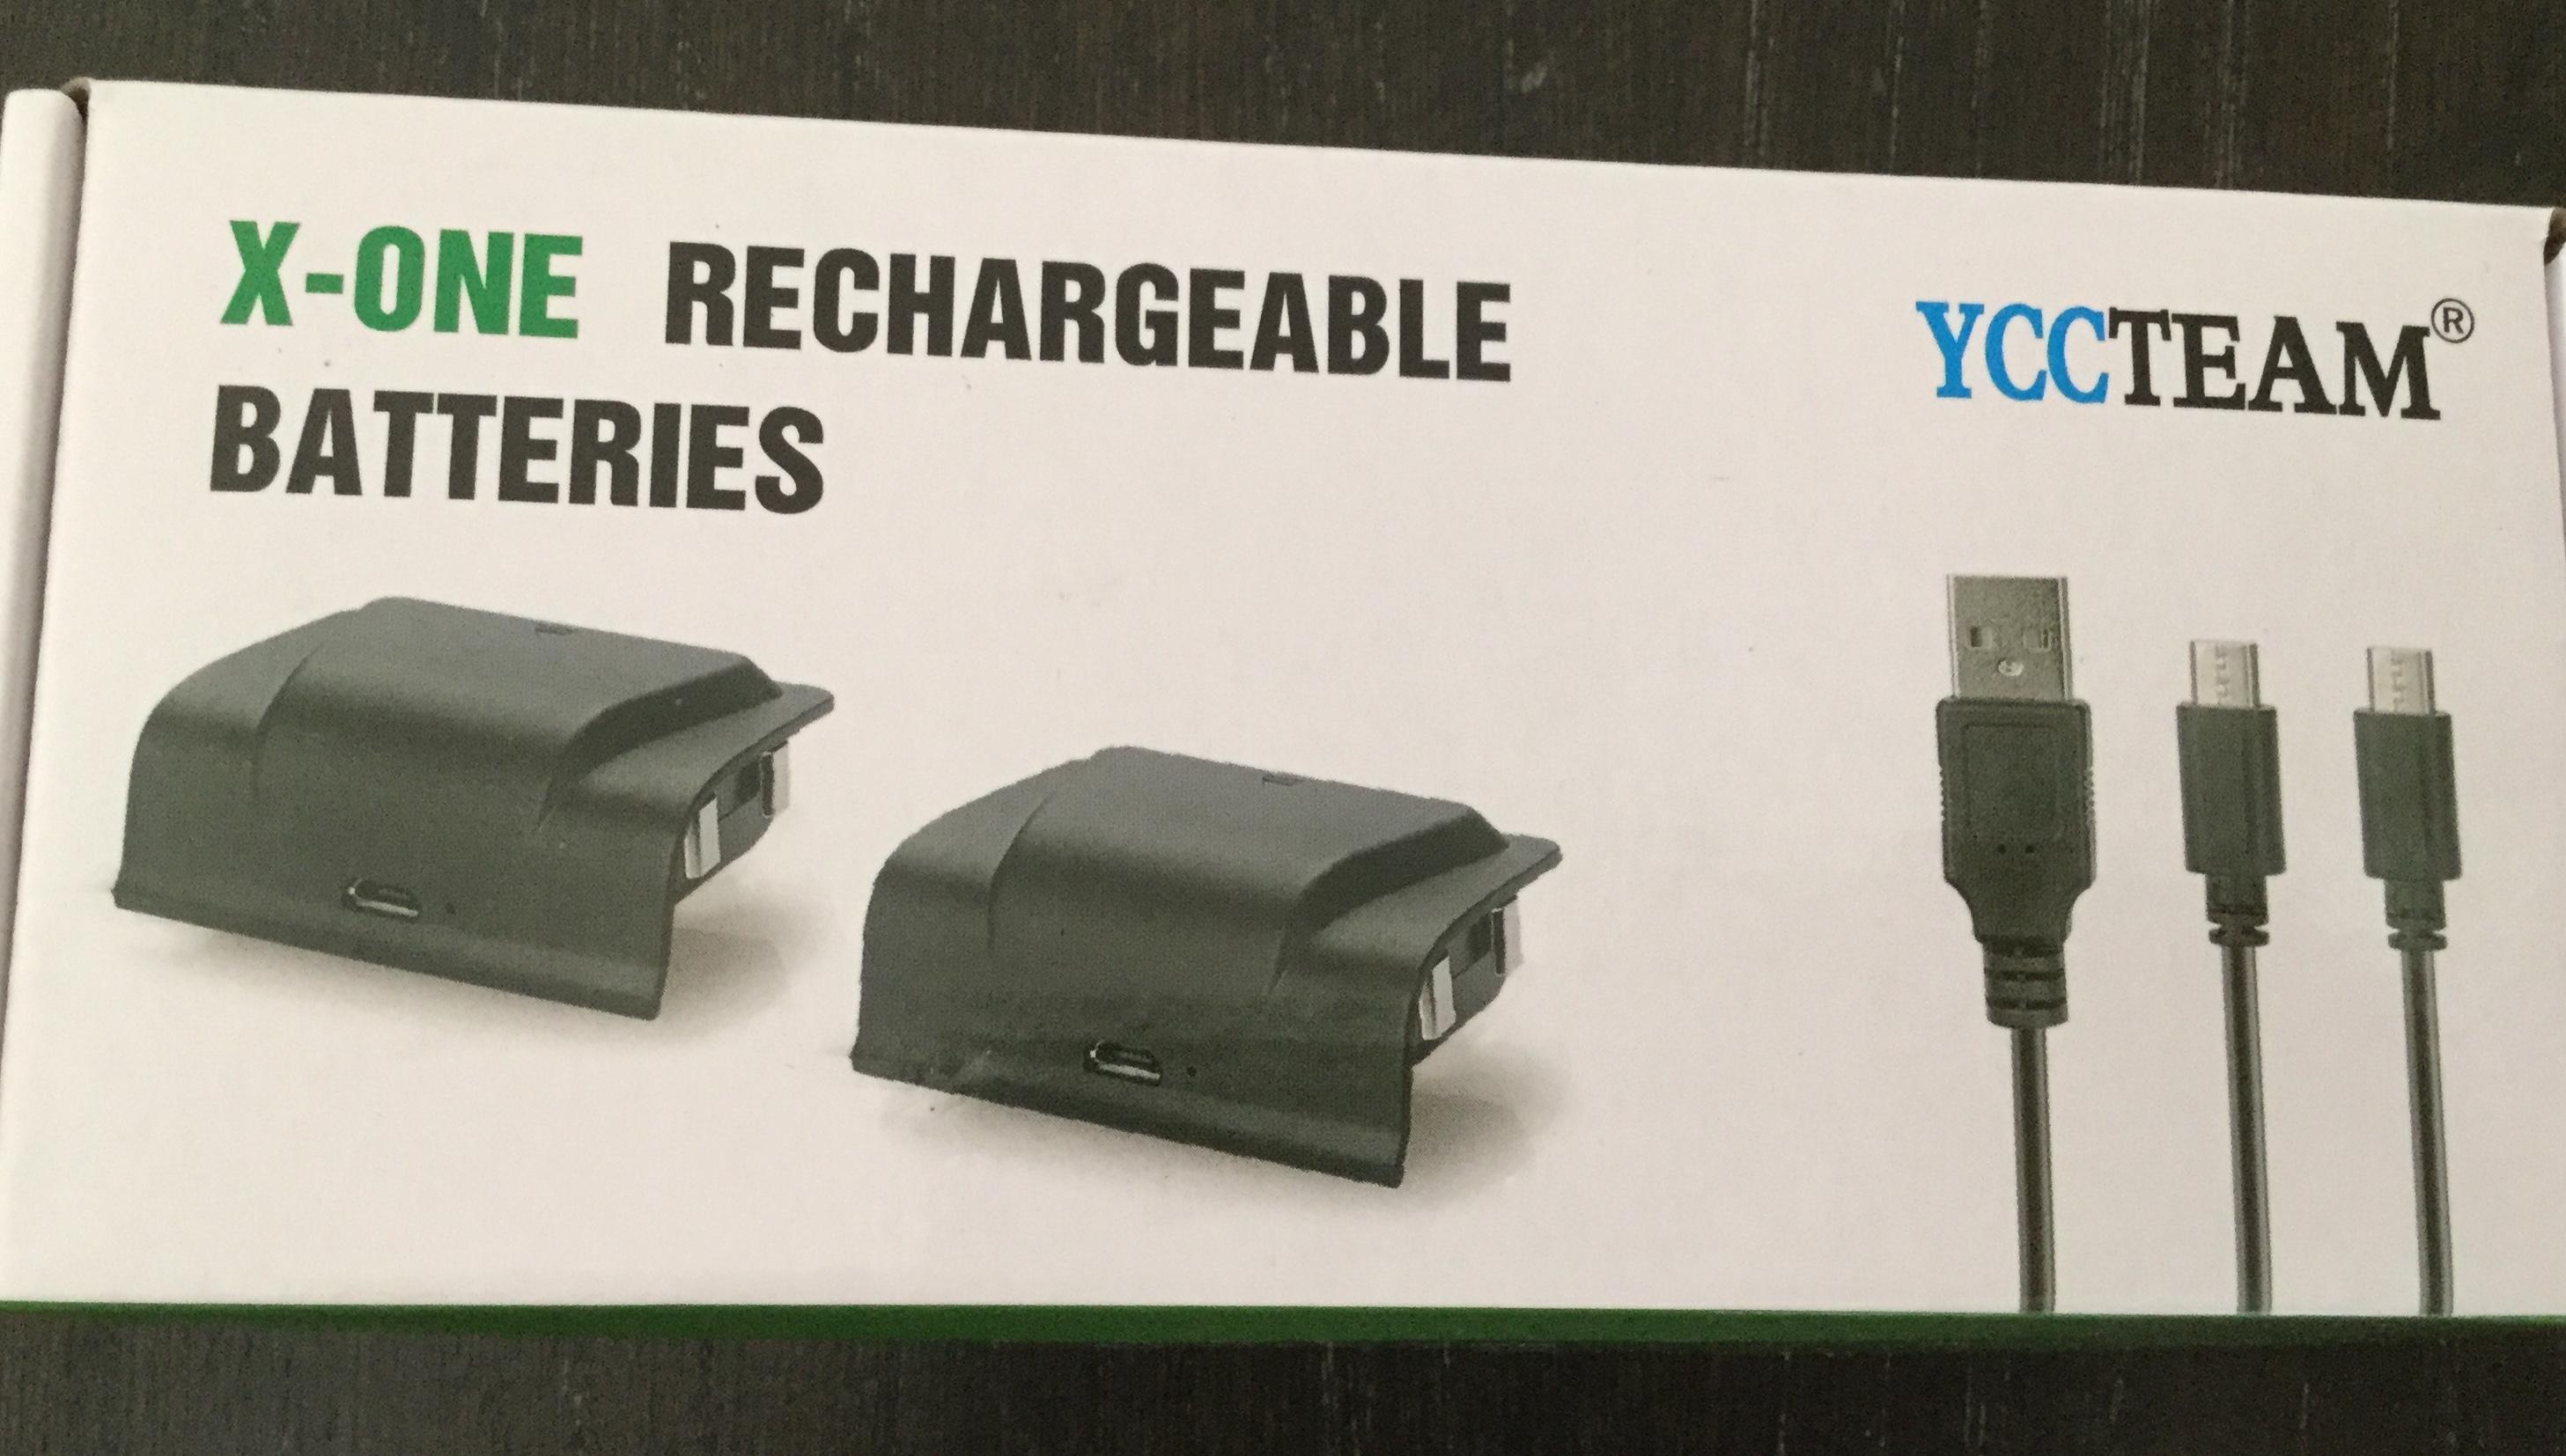 Save batteries